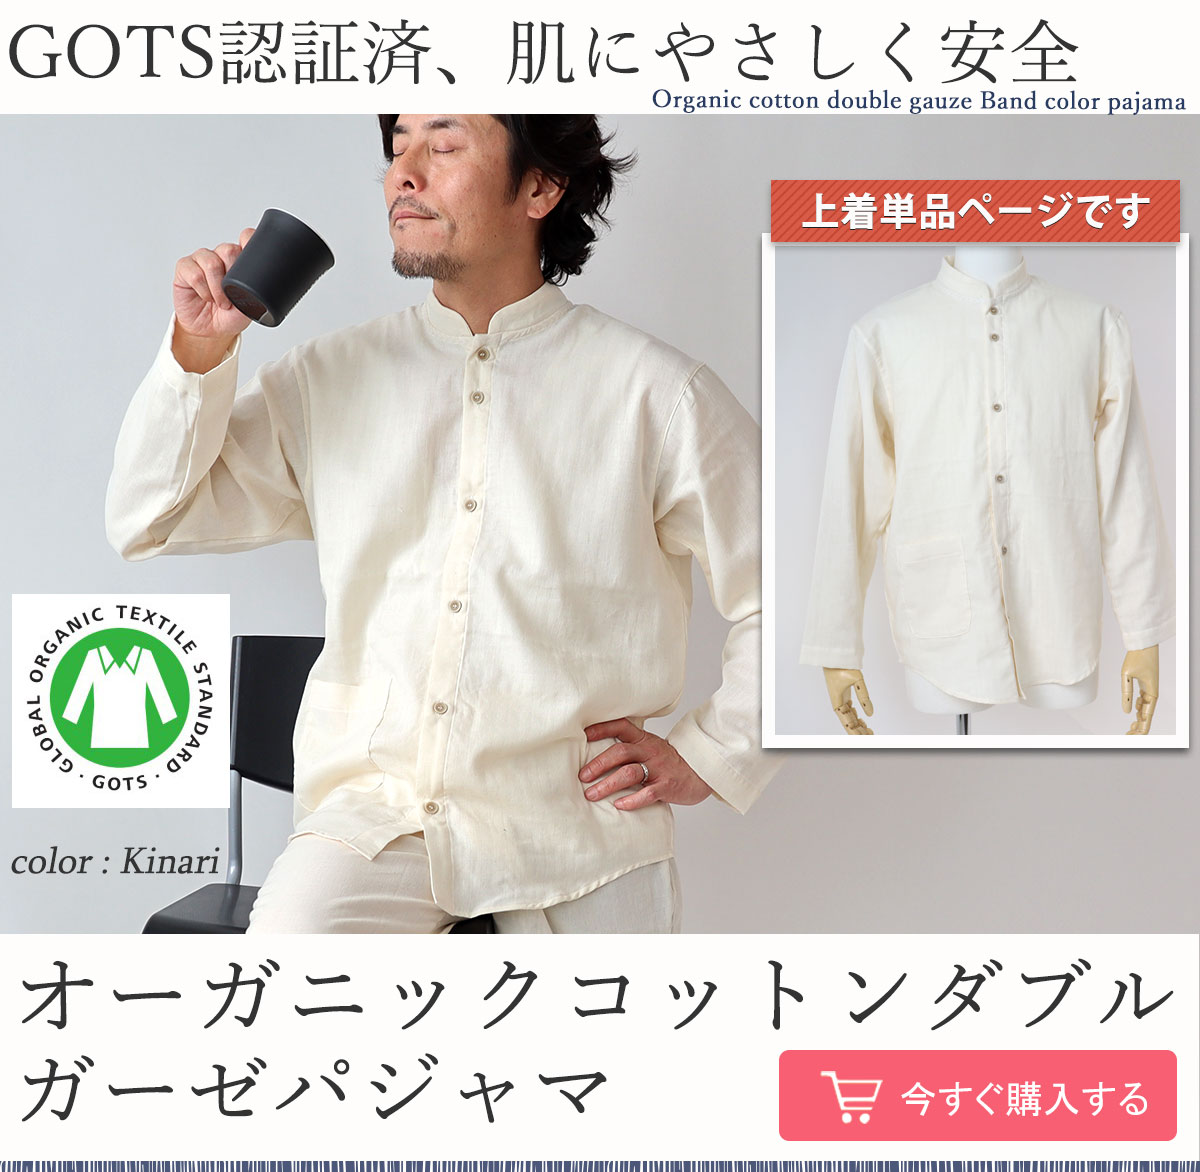 GOTS認証済、肌にやさしく安全、オーガニックコットンダブルガーゼバンドカラーメンズパジャマ